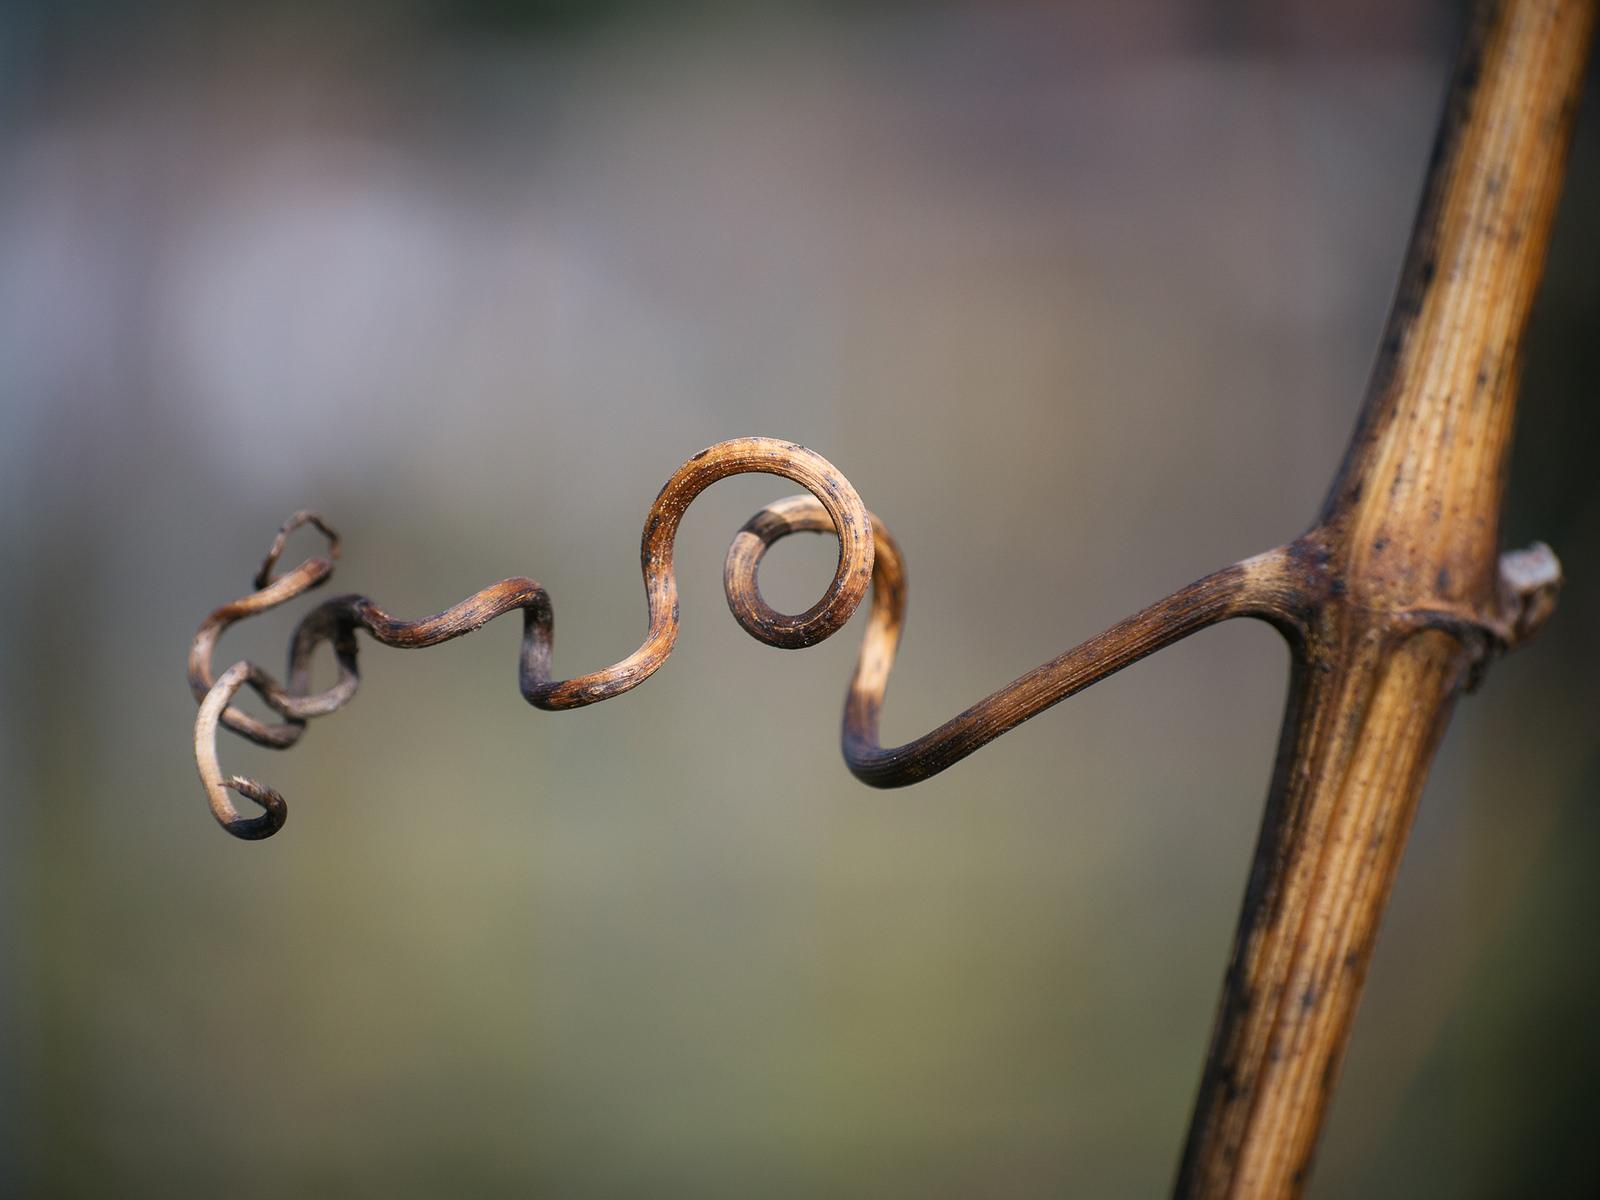 Curlicue copyright 2017 Anja Pietsch